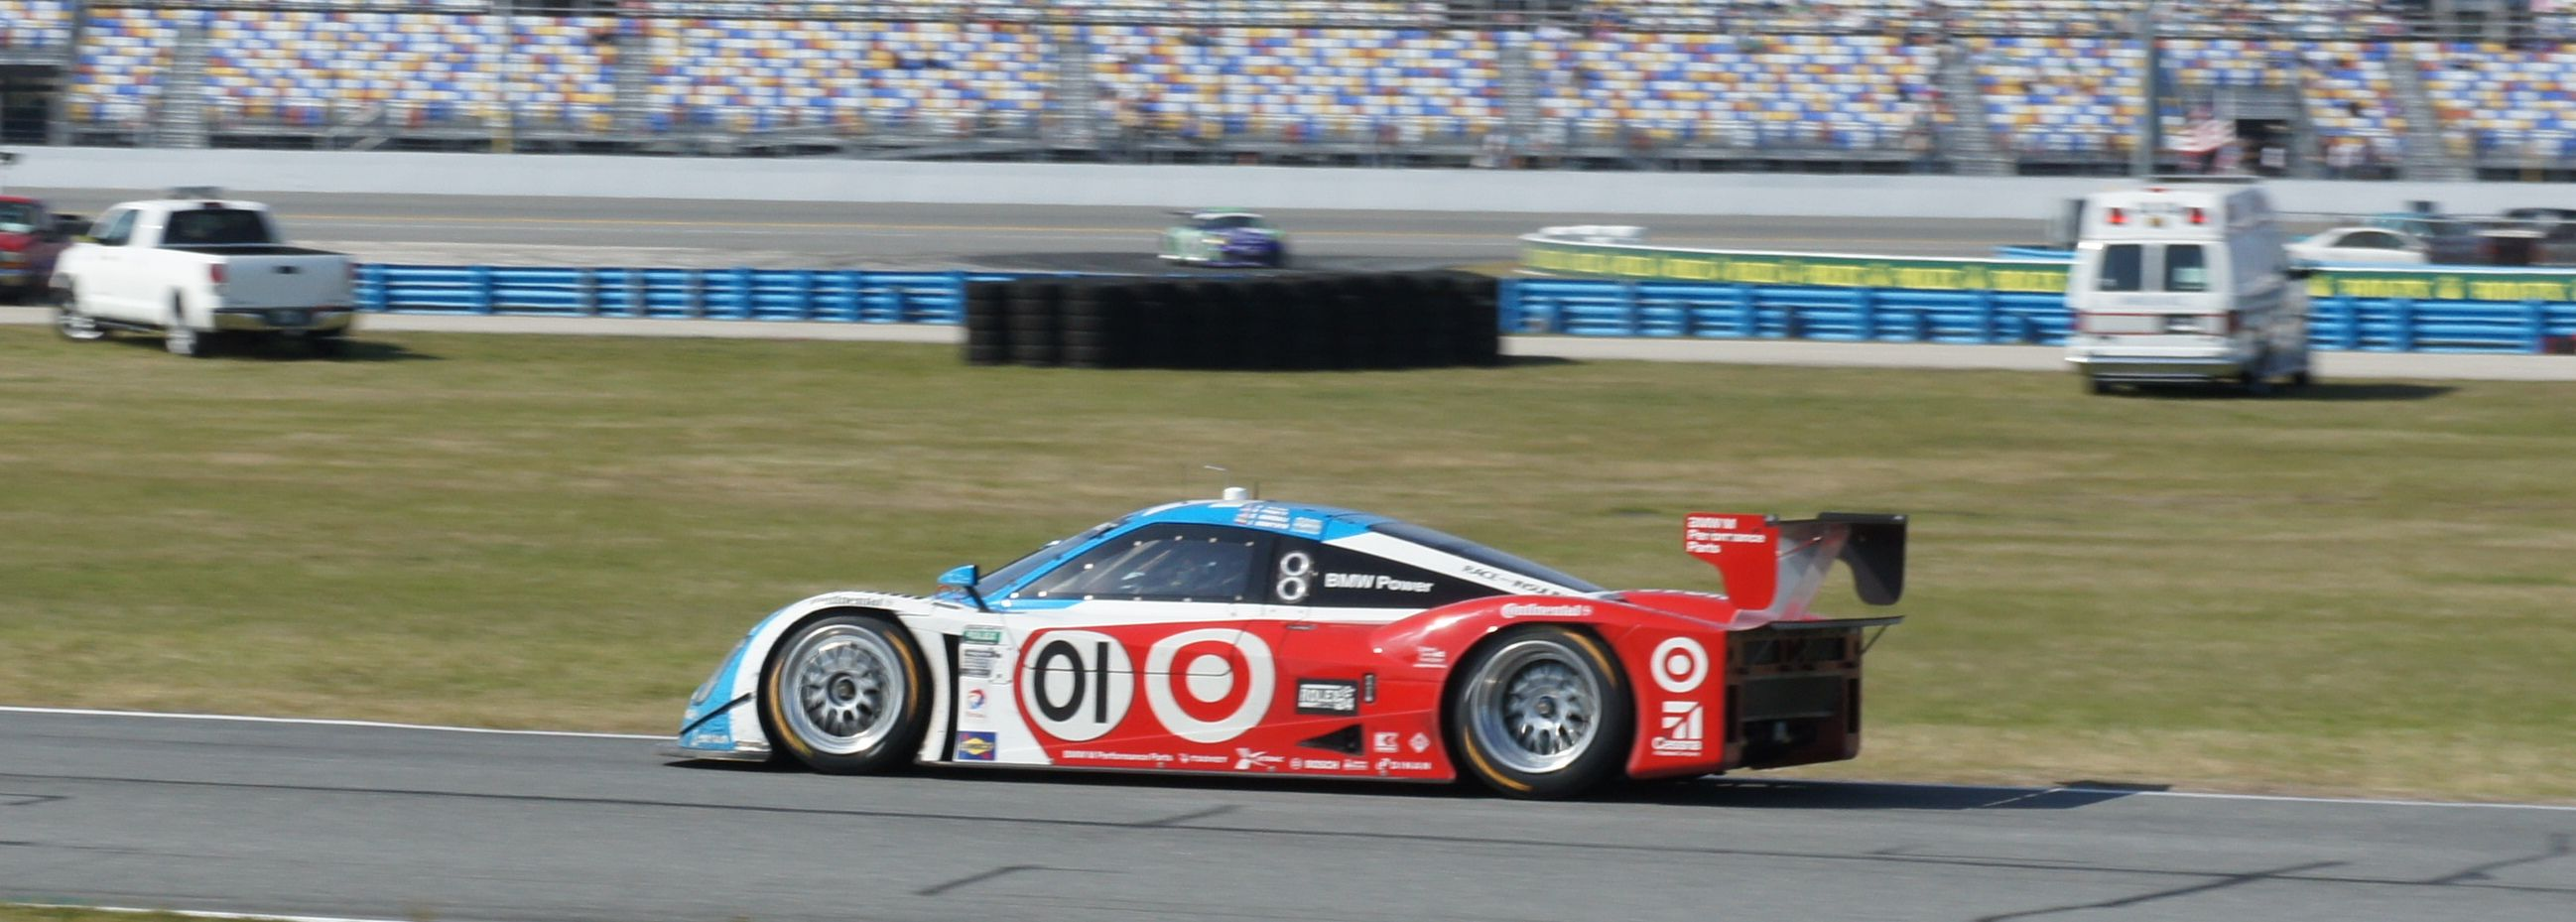 Target Indy Zanardi 1 32 Slot Car Wide Body Slot Cars Slot Slot Car Racing